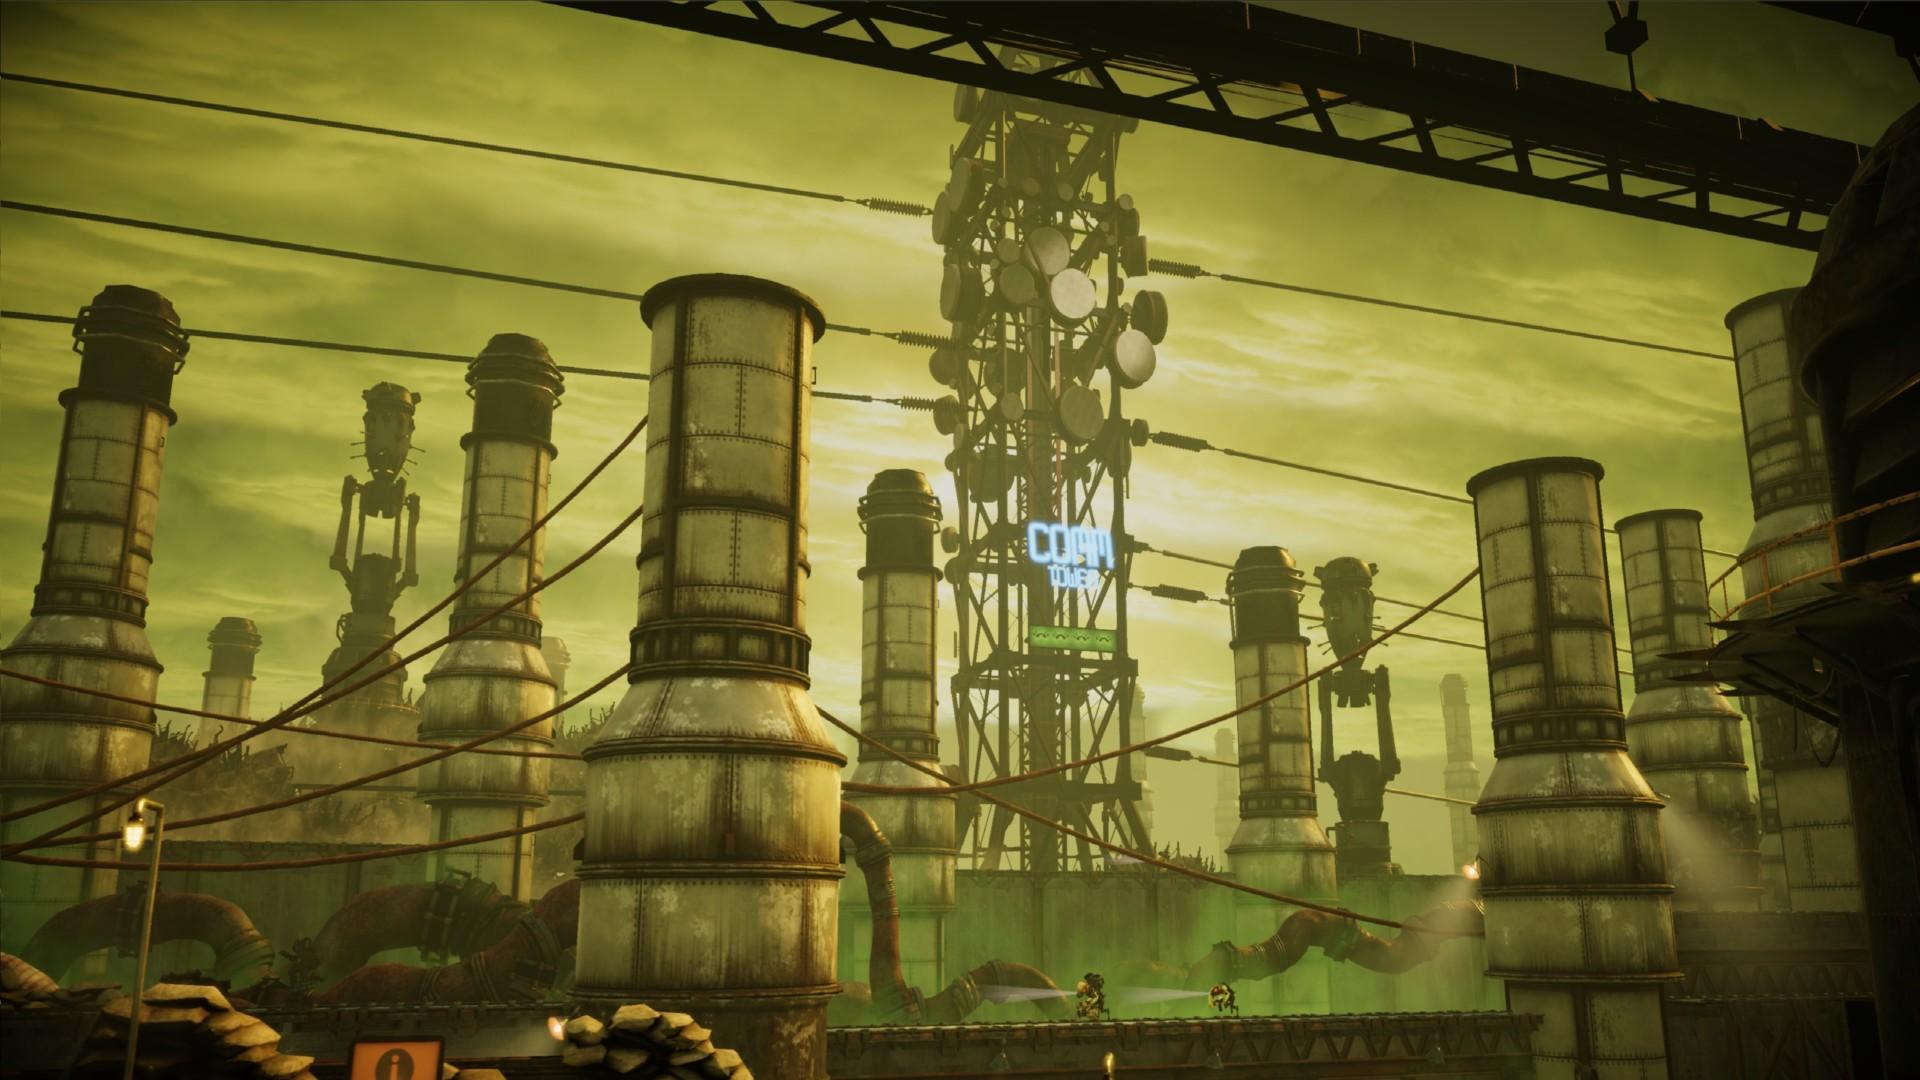 Oddworld Soulstorm Mudokon Locations Guide Slig Barracks Necrum The Mines